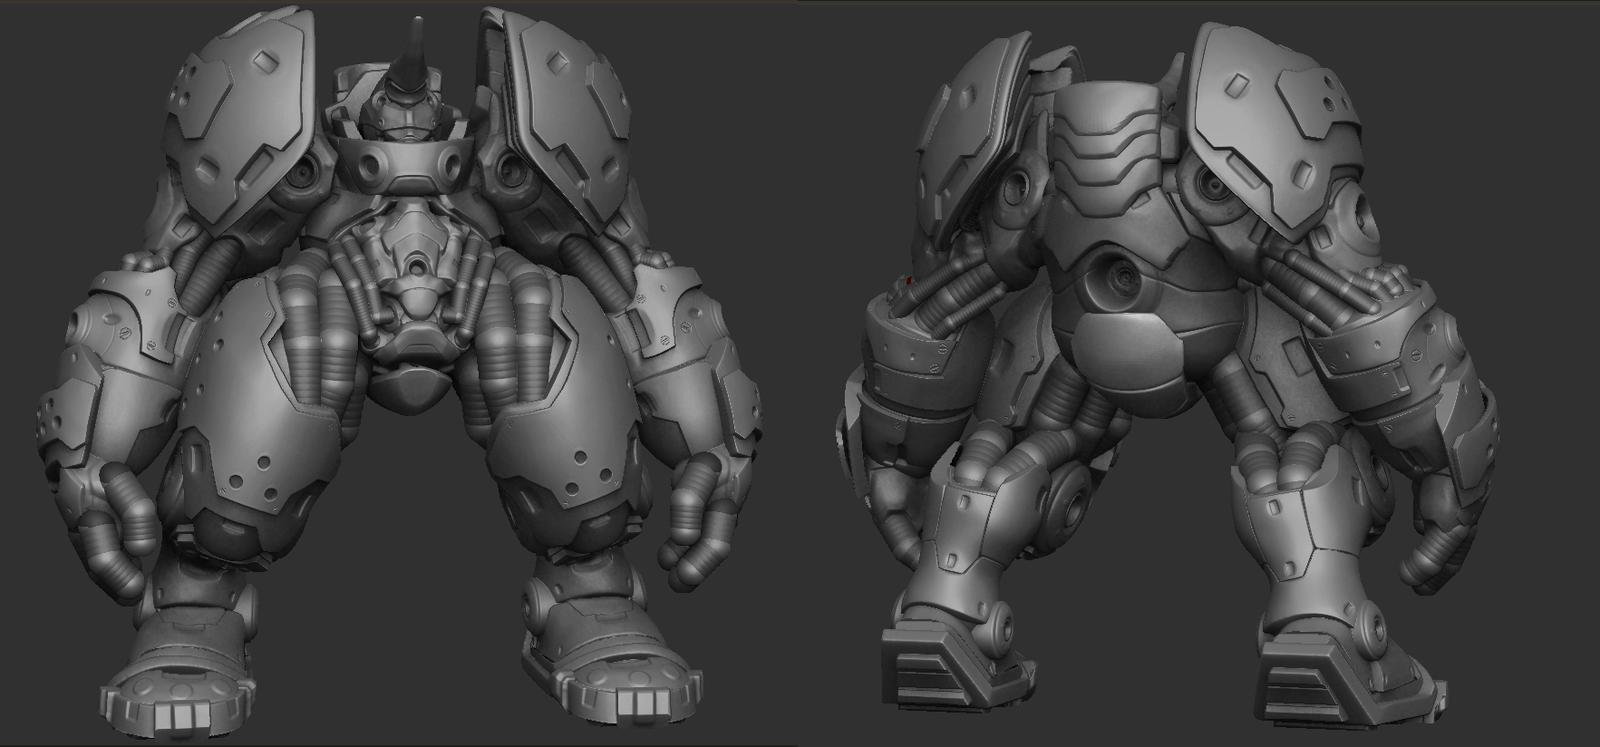 Bot Design Hp 01 By 31883milesperhour On Deviantart